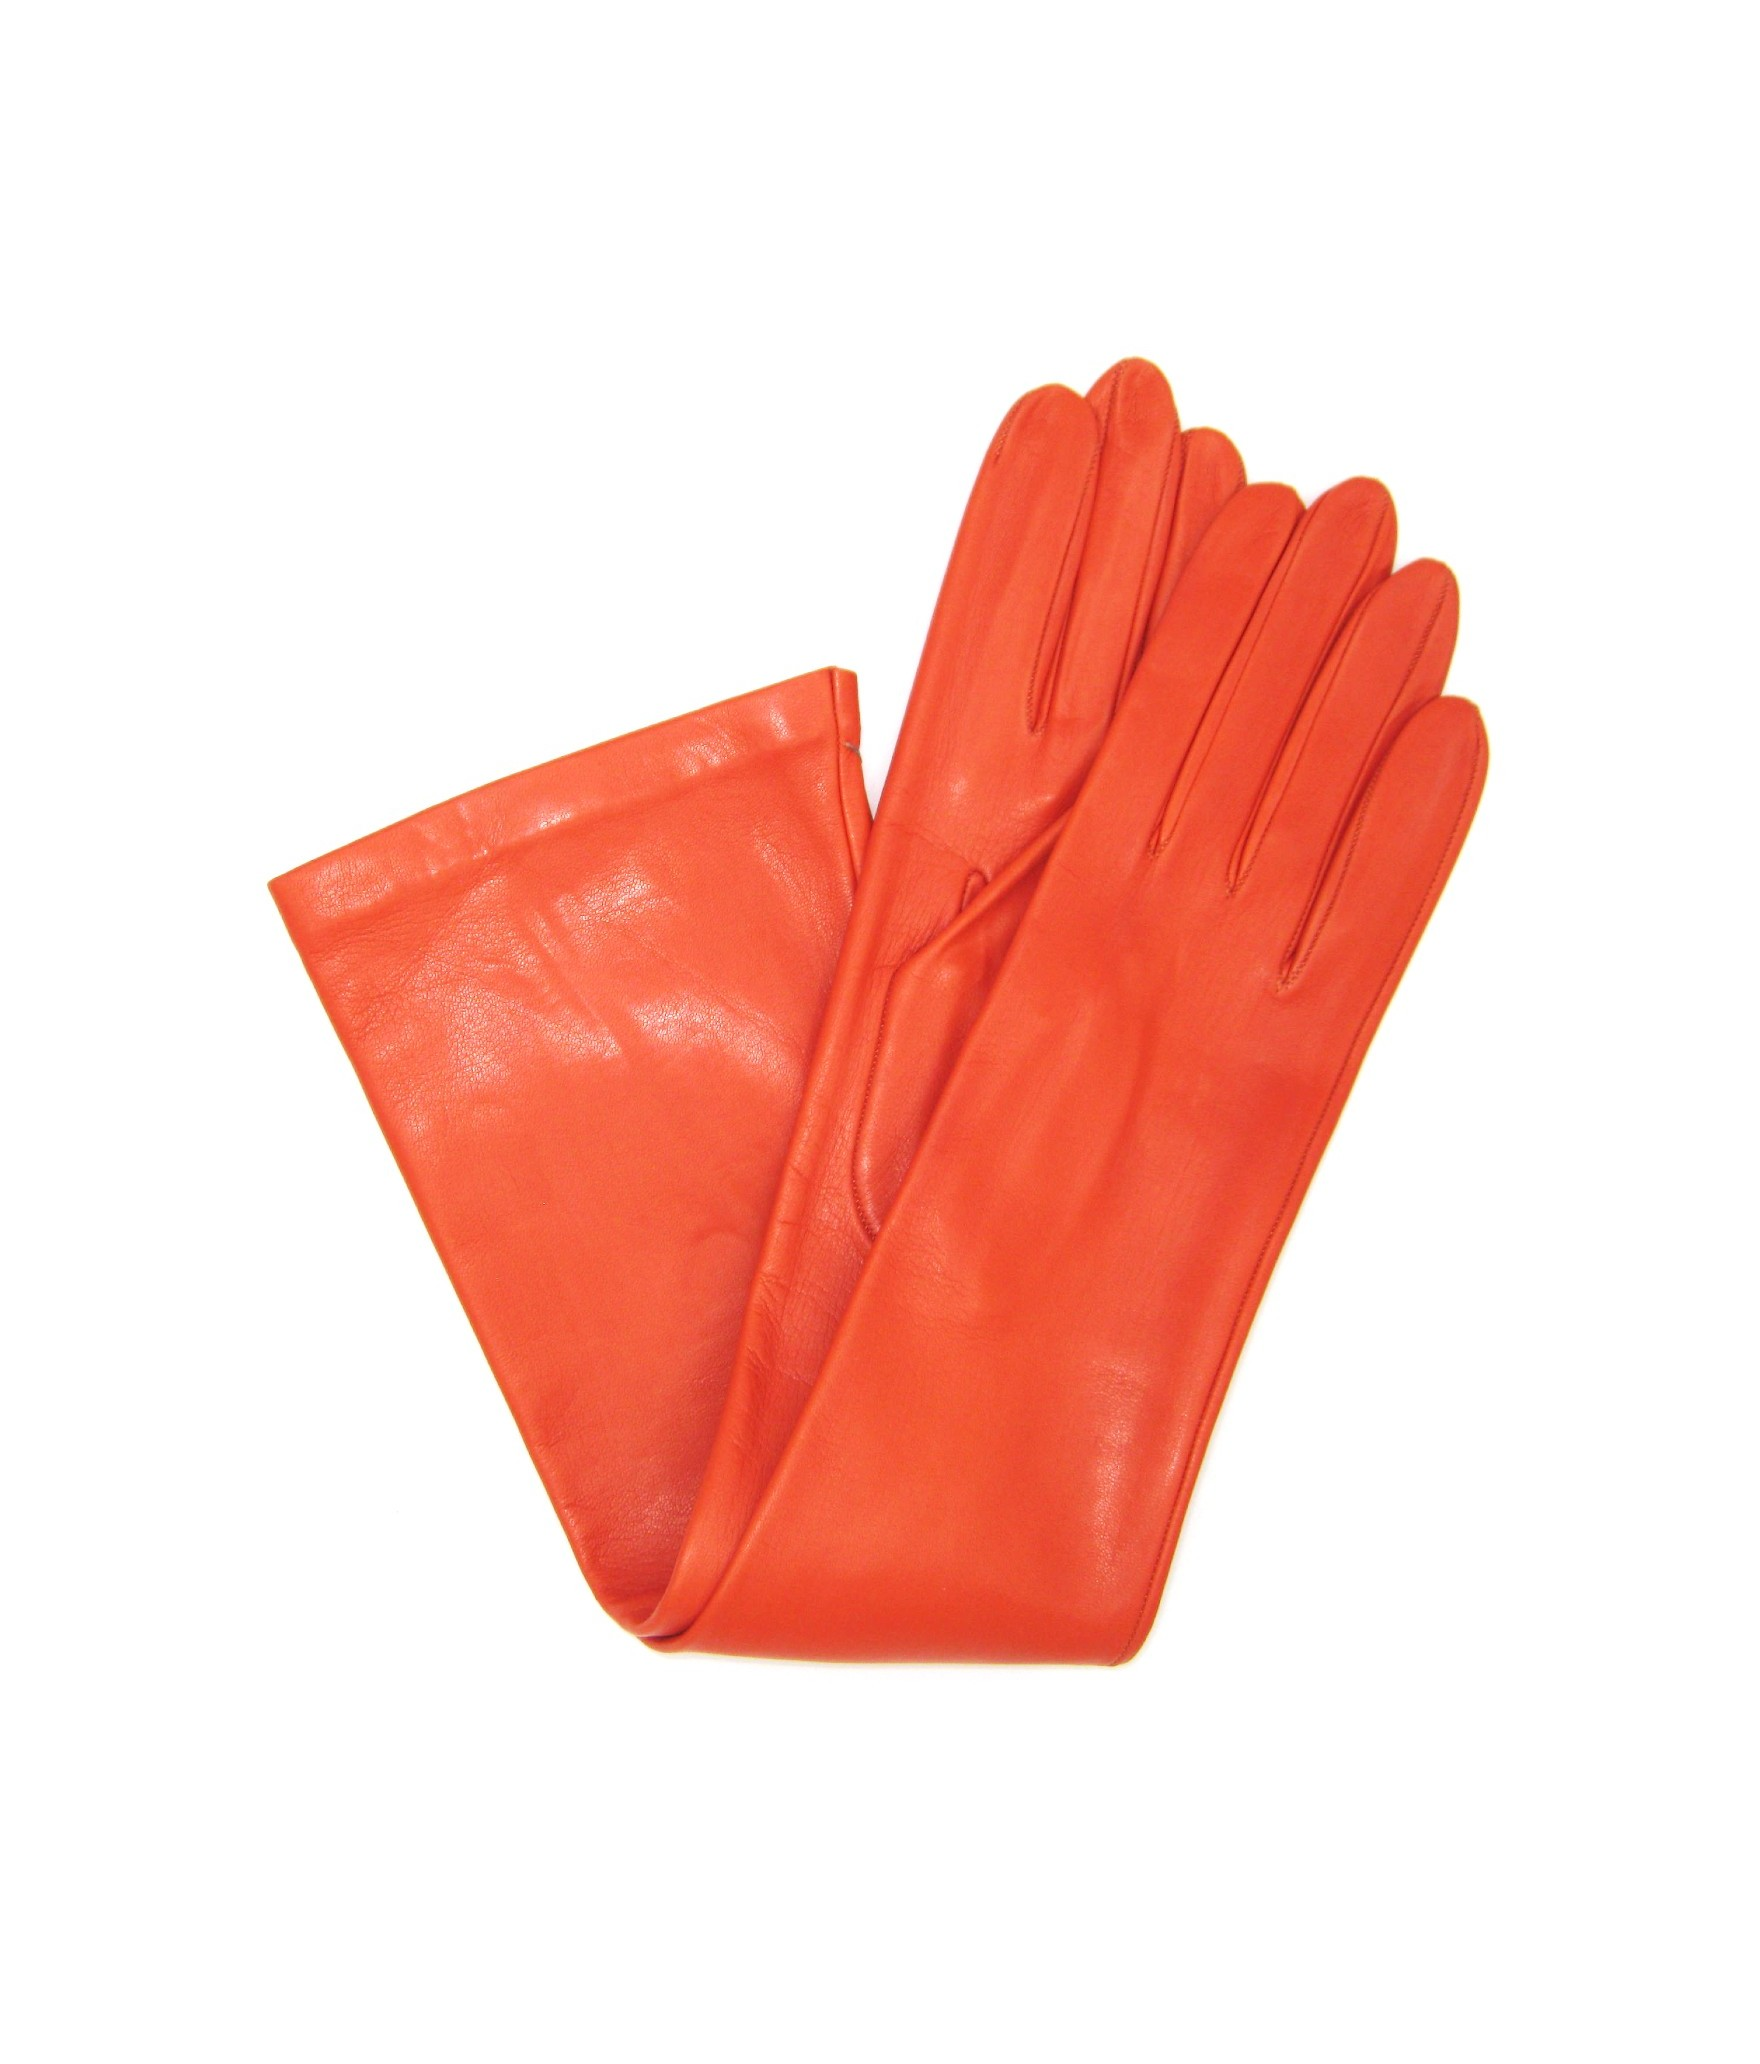 Nappa leather gloves 10bt silk lined Orange Sermoneta Gloves